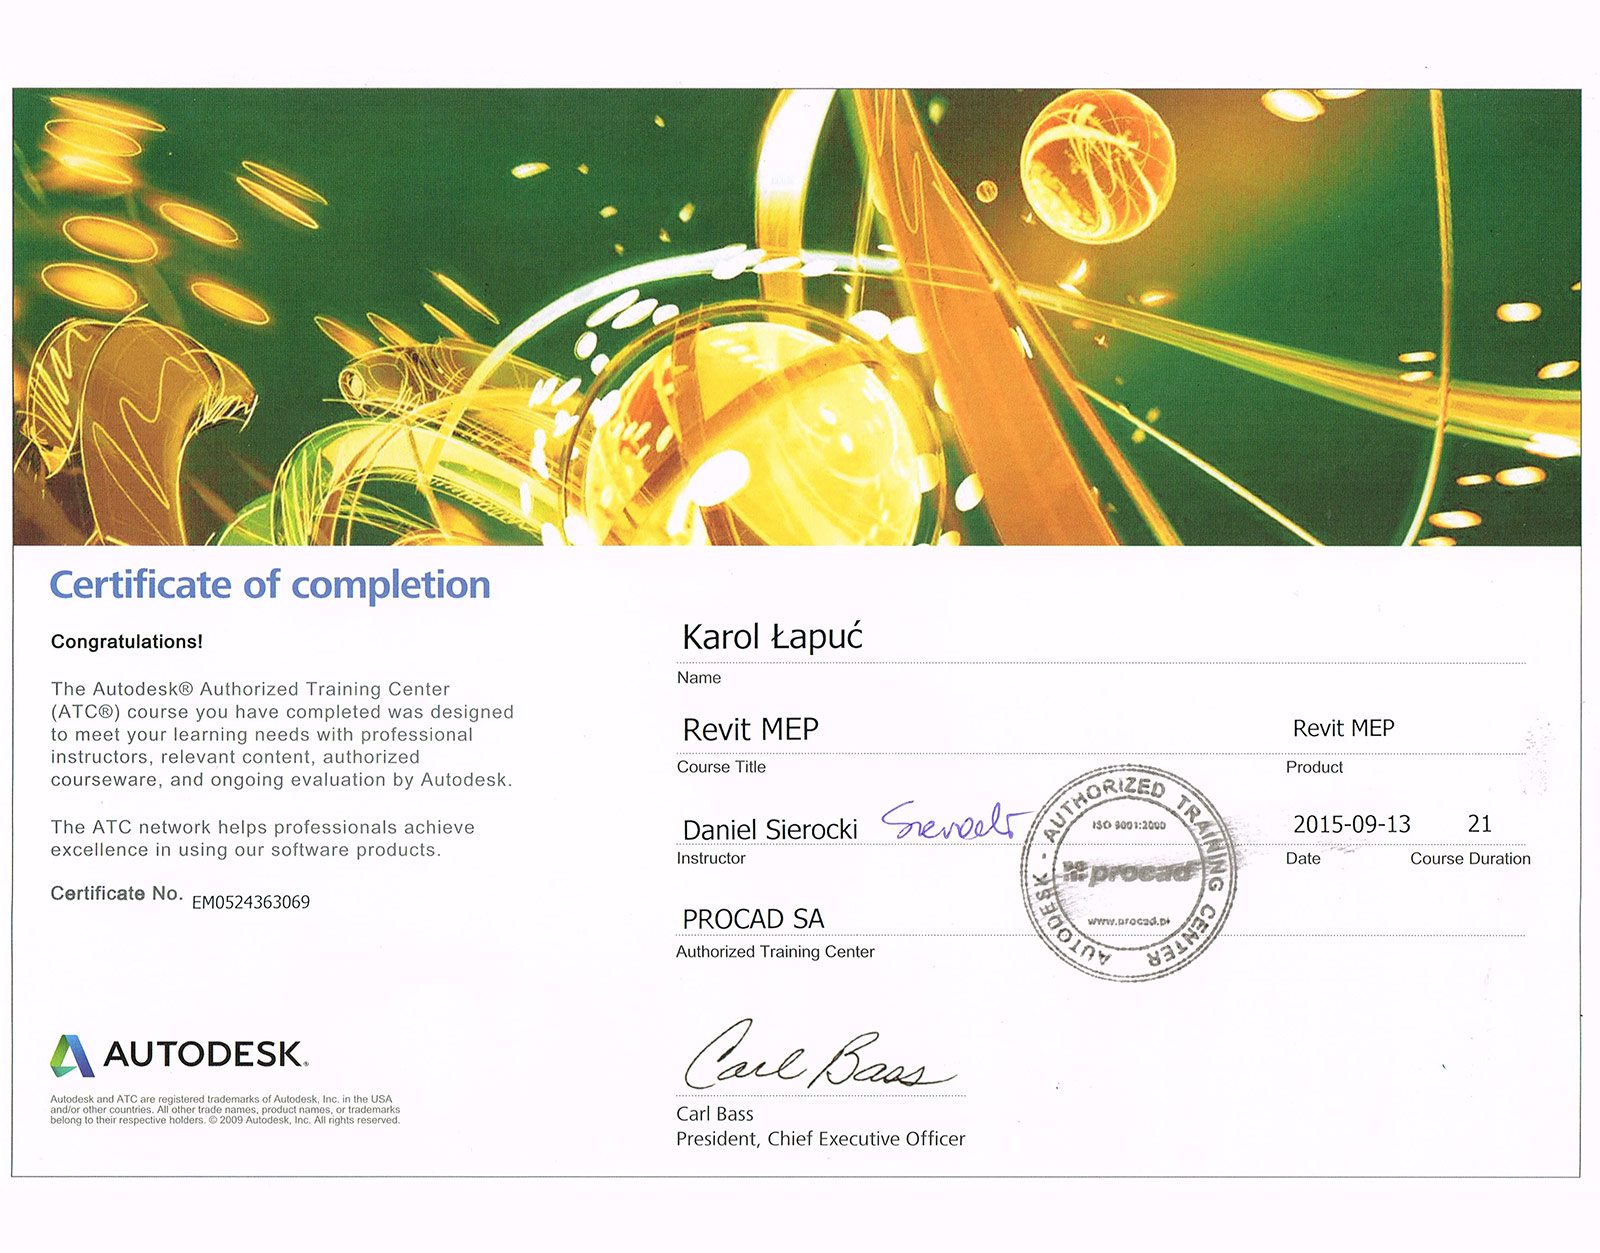 certyfikat_ccf20170110_0000